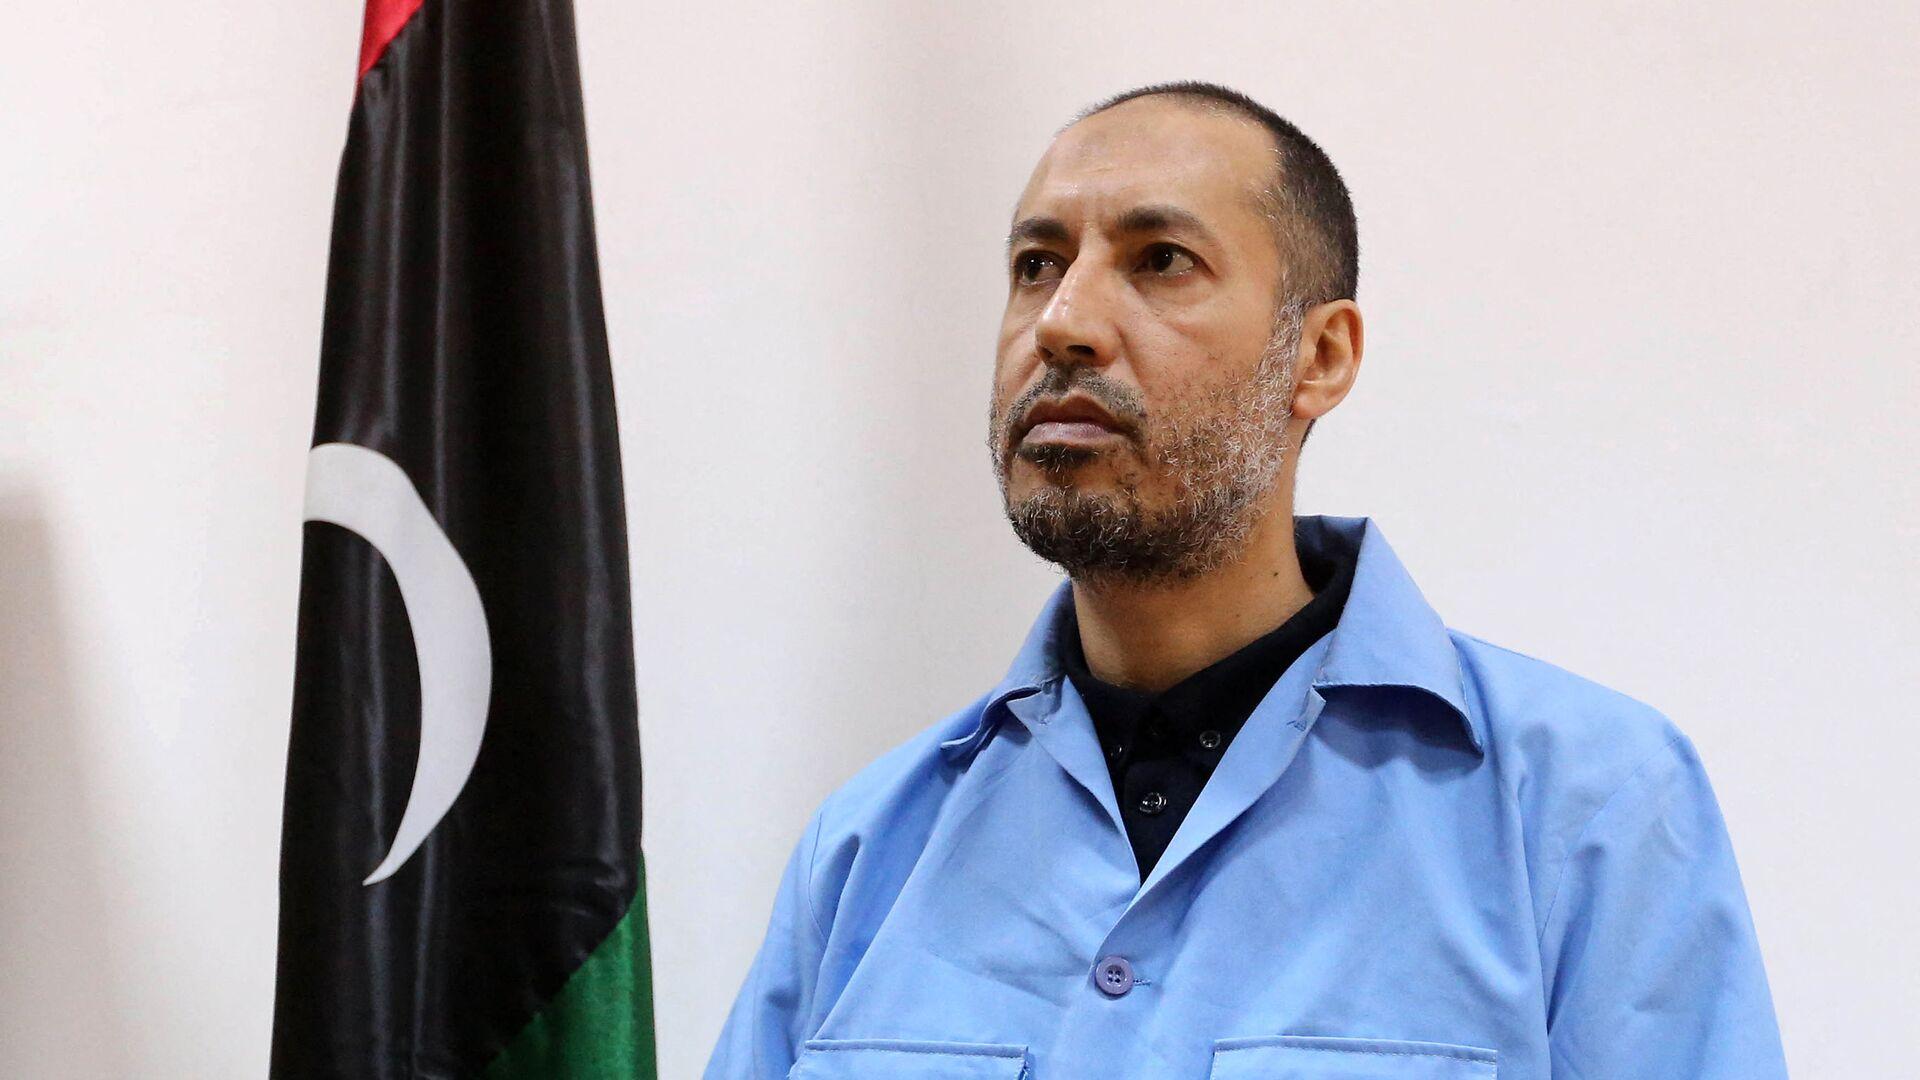 Saadi Gheddafi, il figlio dell'ex leader libico Muammar Gheddafi - Sputnik Italia, 1920, 06.09.2021